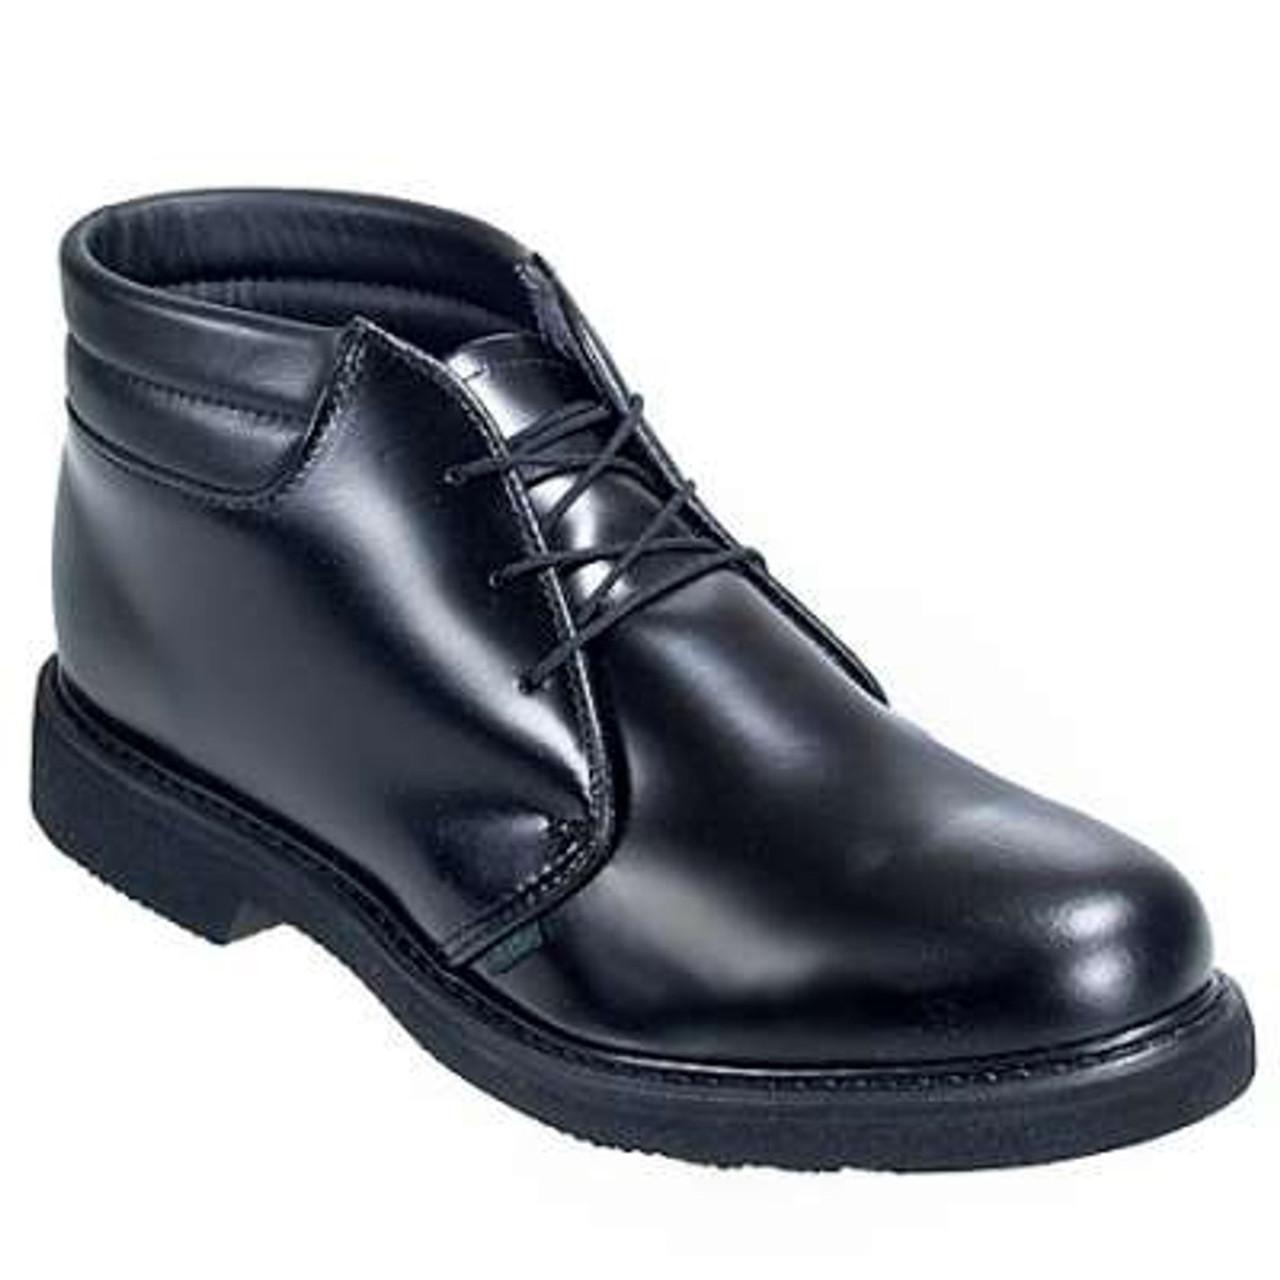 Bates 79-B Mens Lites Leather Postal